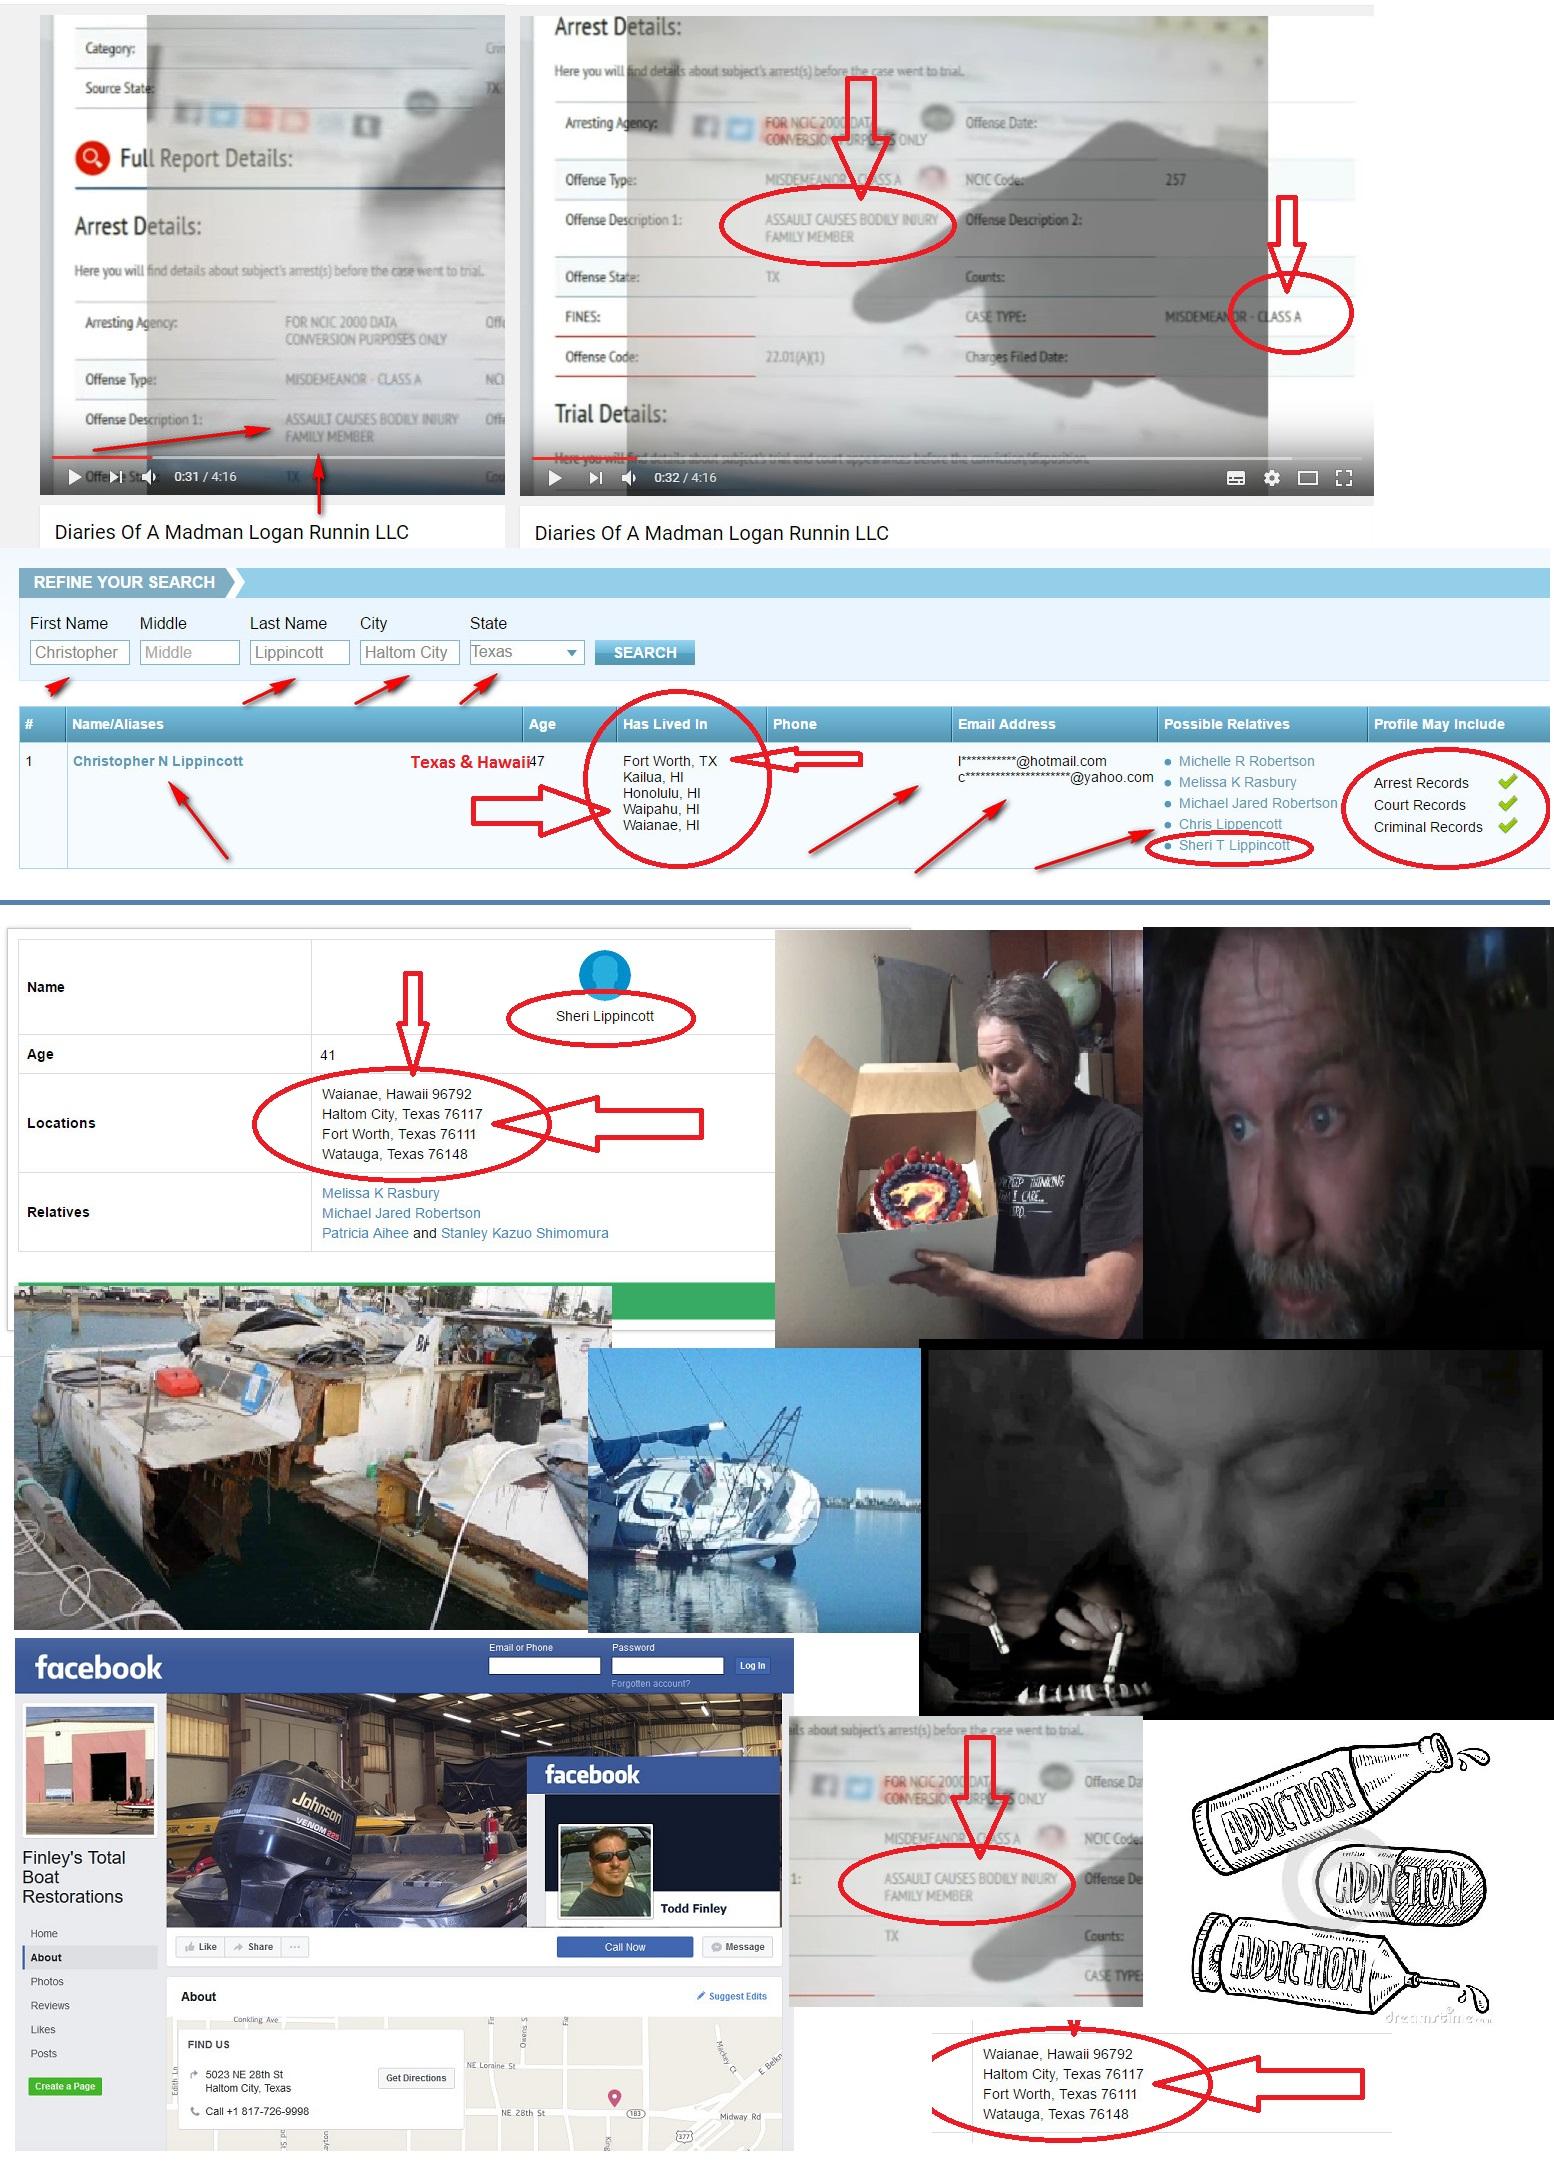 ChristopherNLippincottCriminalrecordTROLLfinleystotalboatrestorationsTexas